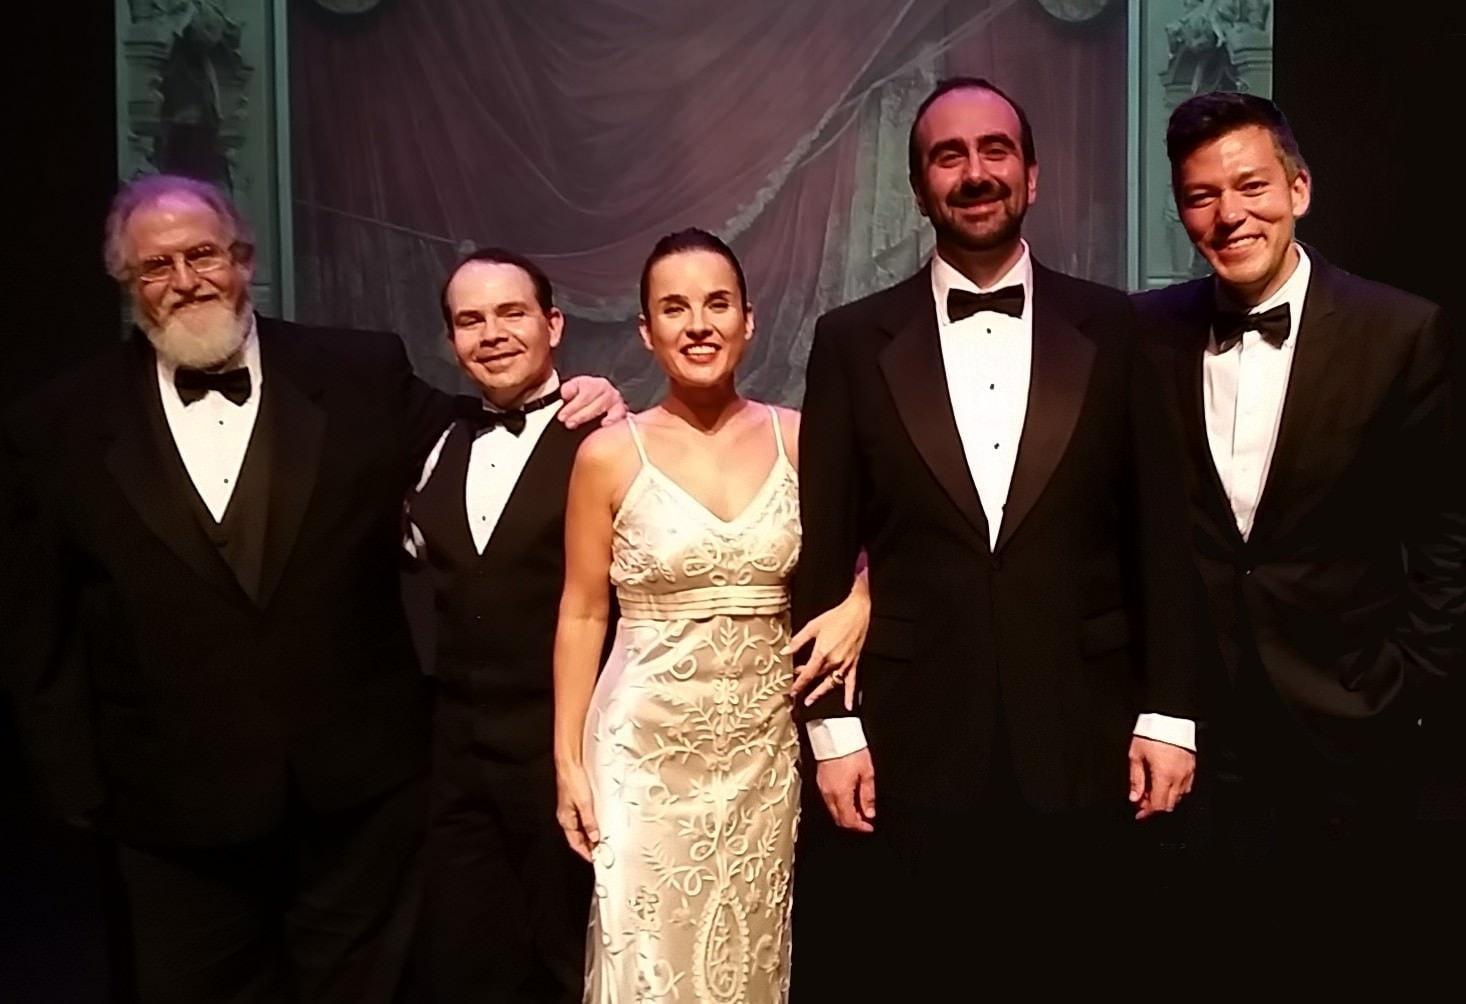 Left to right: Frank Conlon, piano;  Leonid Sushansky, violin; Yana Eminova, soprano; Anton Belov, baritone; and Sean Neidlinger, cello. Photo by Robert Jansen.